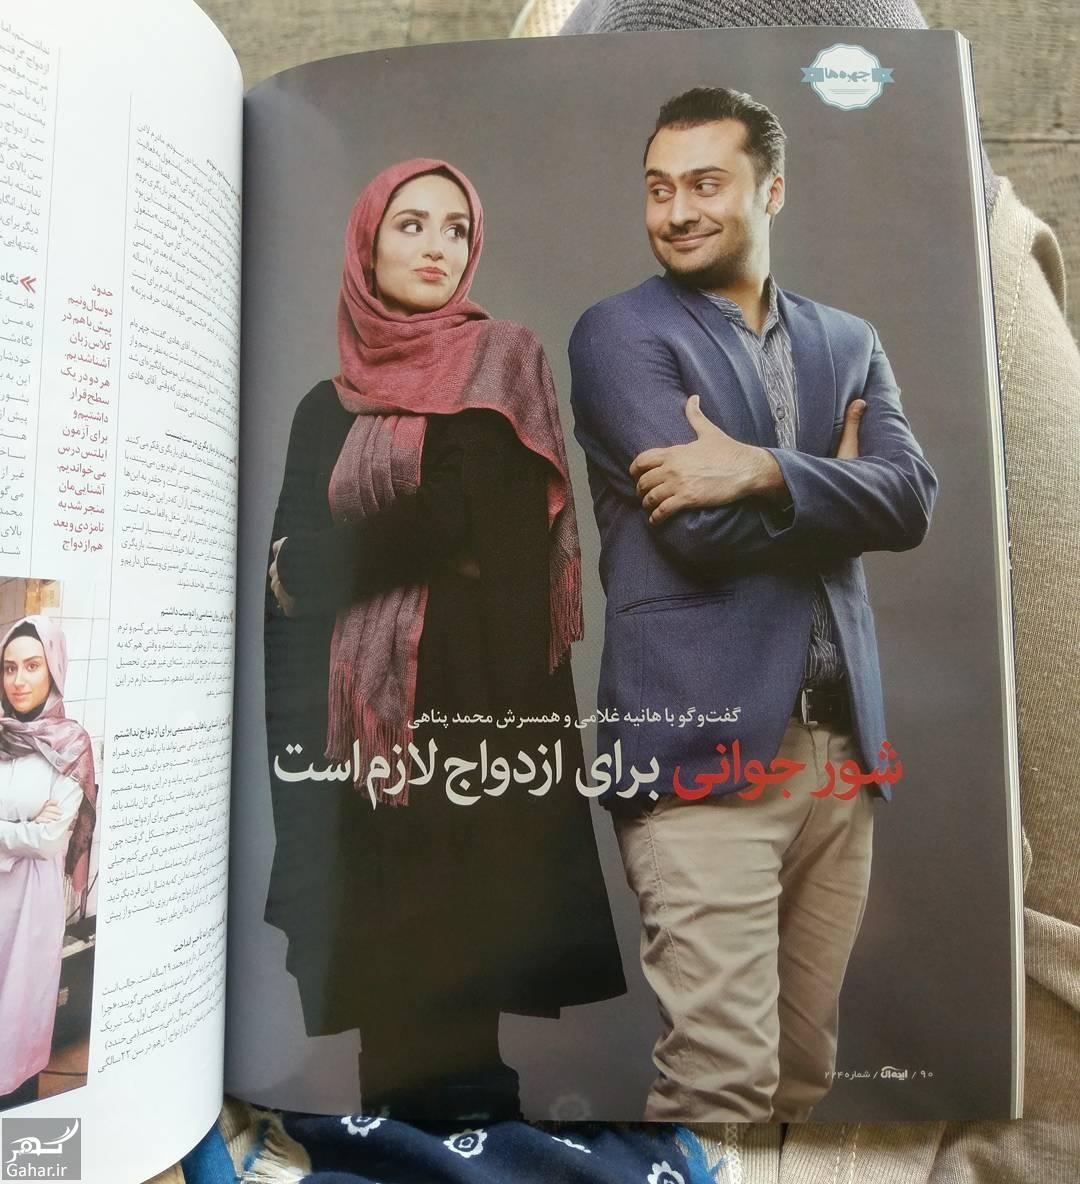 666051 Gahar ir عکس های جذاب هانیه غلامی و همسرش در مجله «ایده آل»